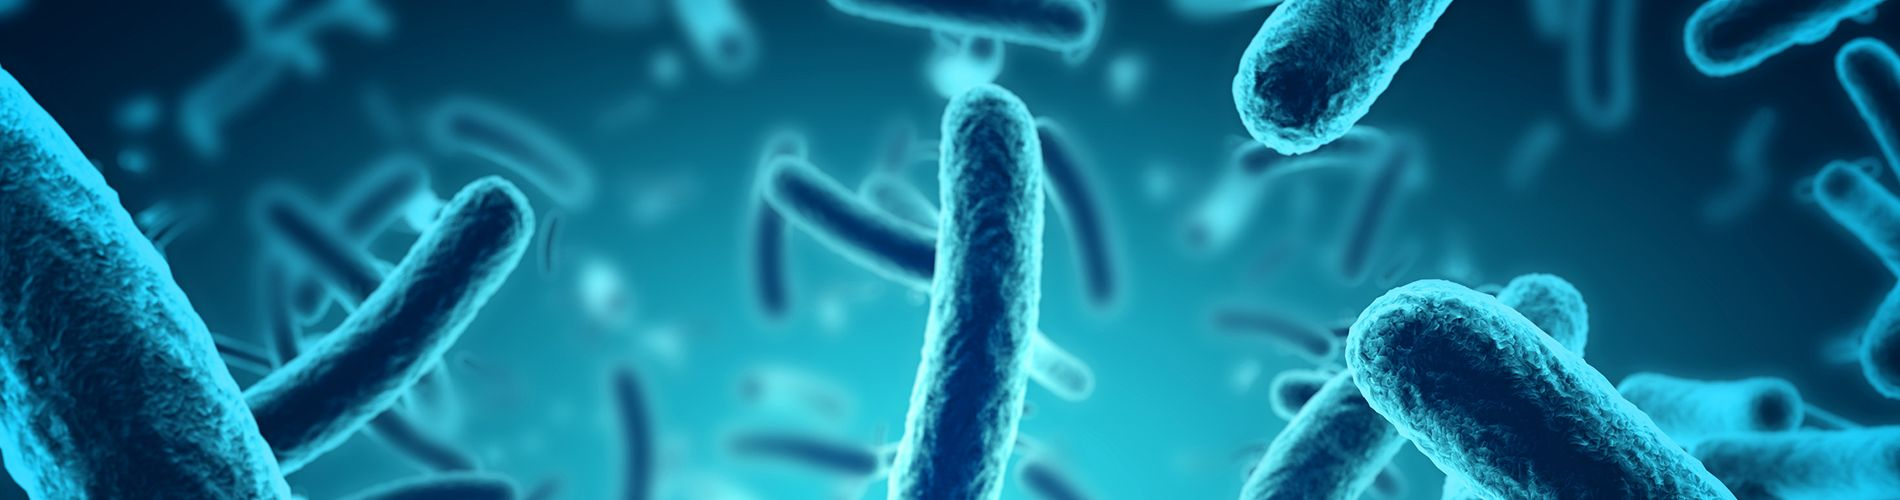 Pestilence and Disease